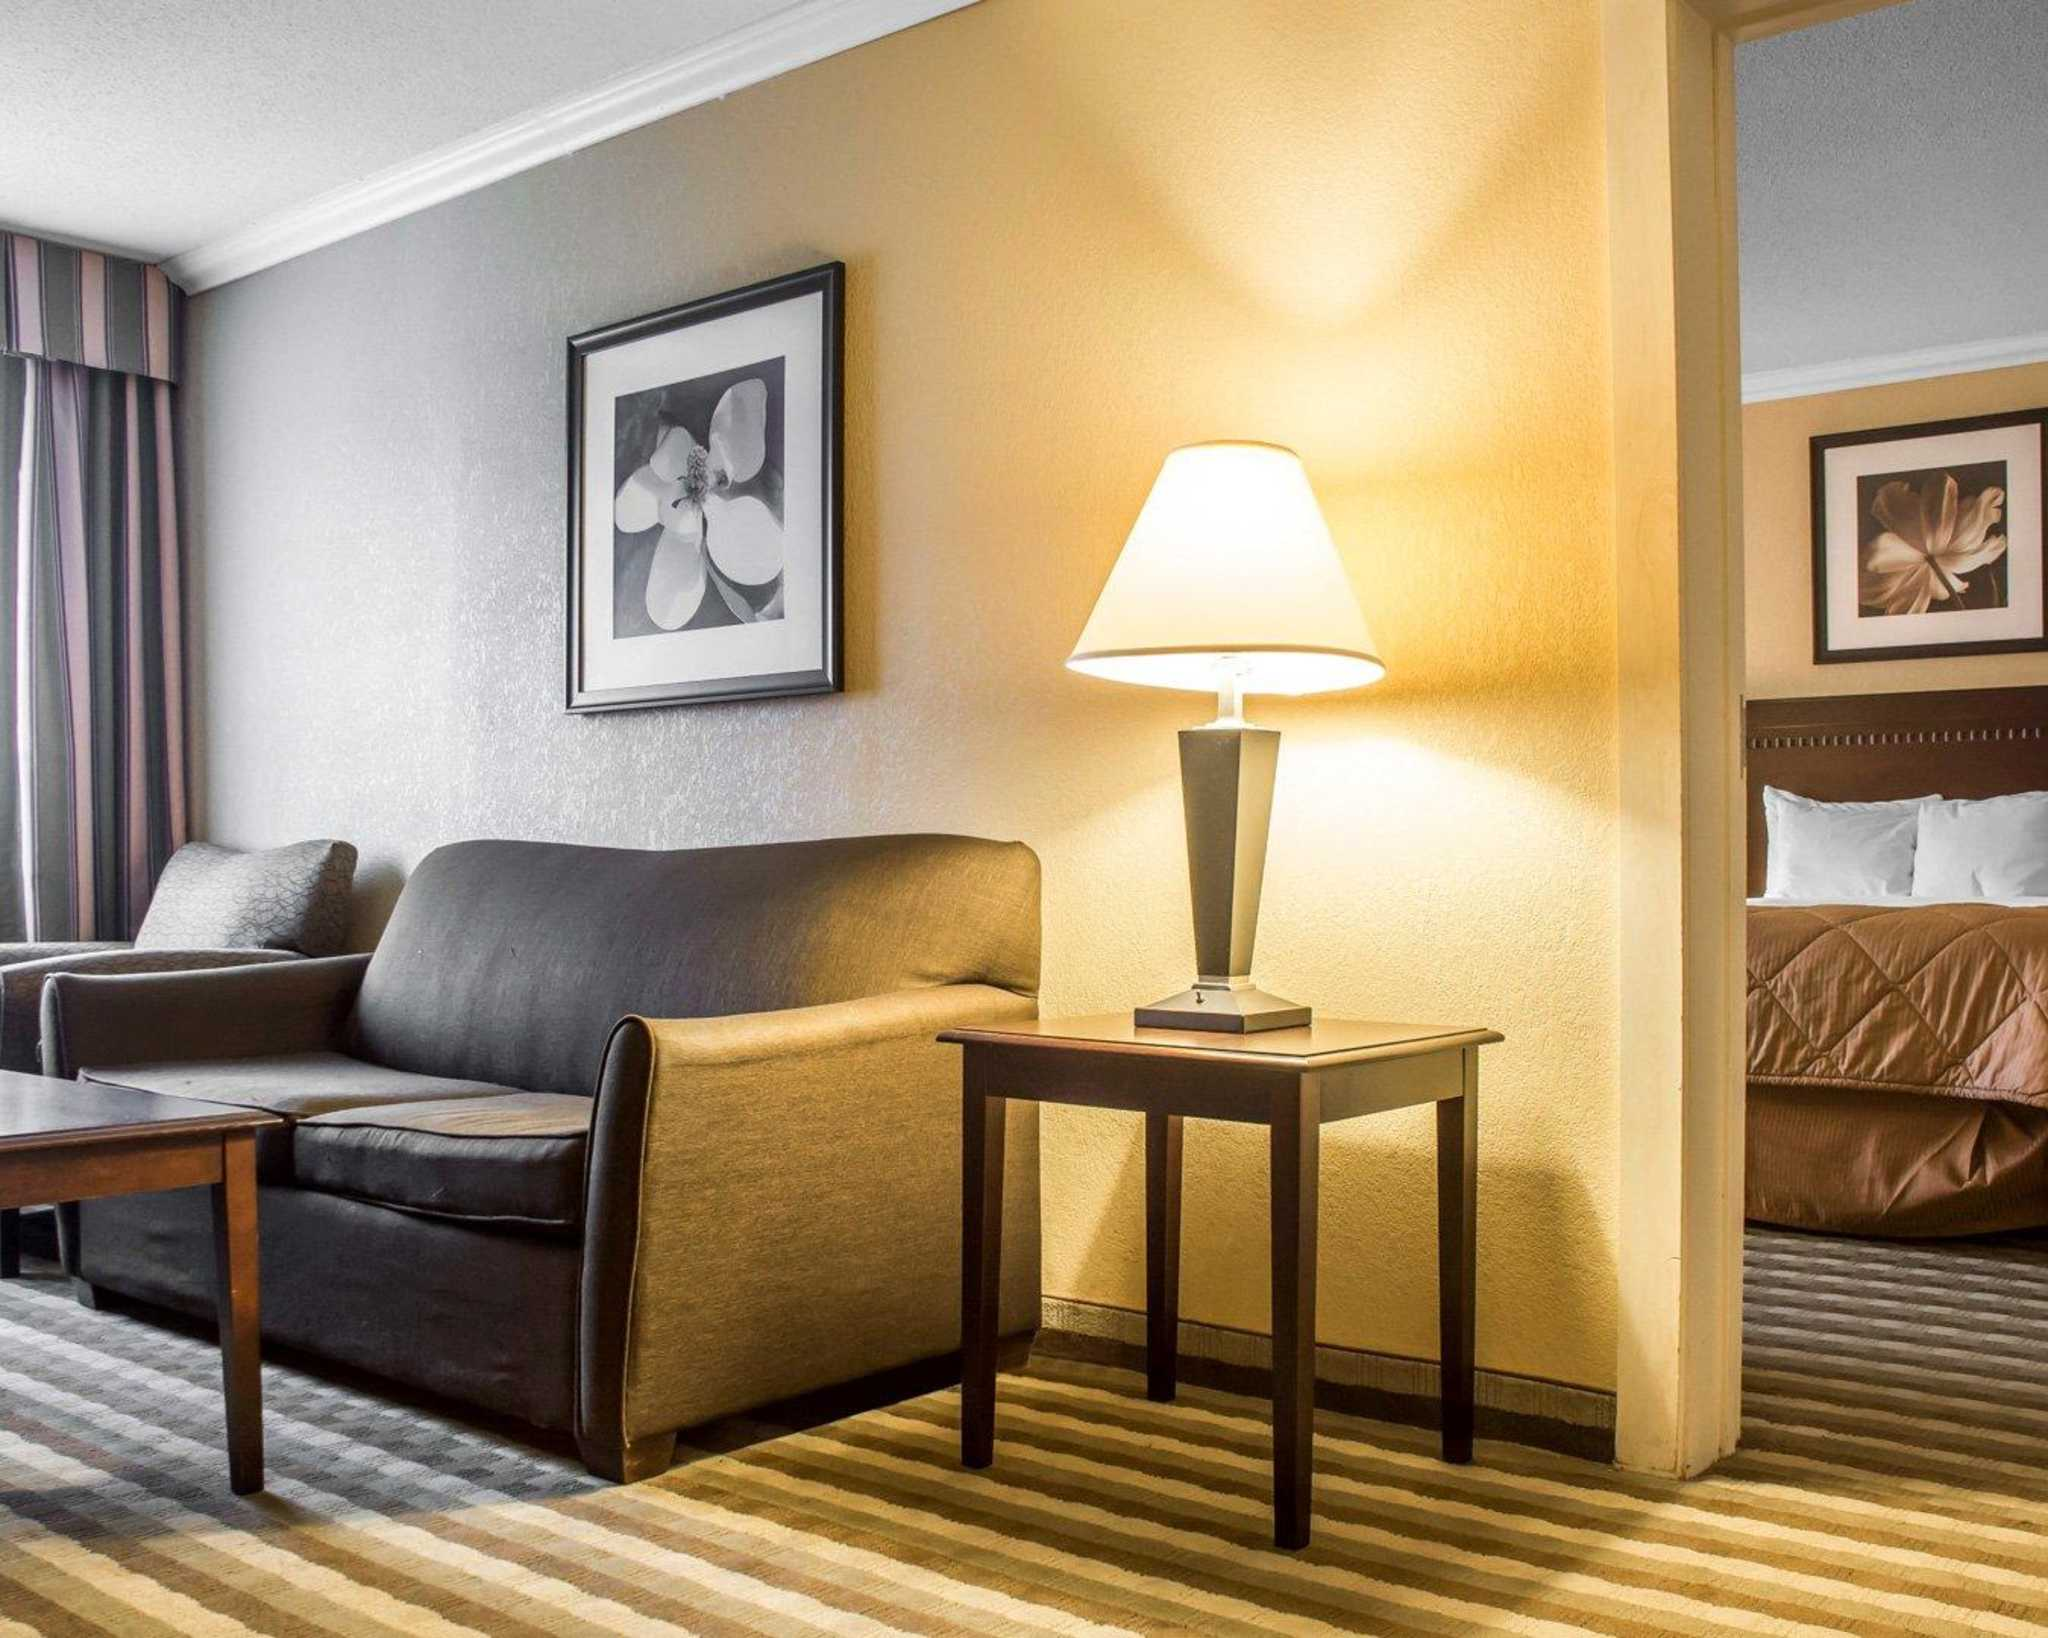 Quality Inn & Suites Fairgrounds image 16